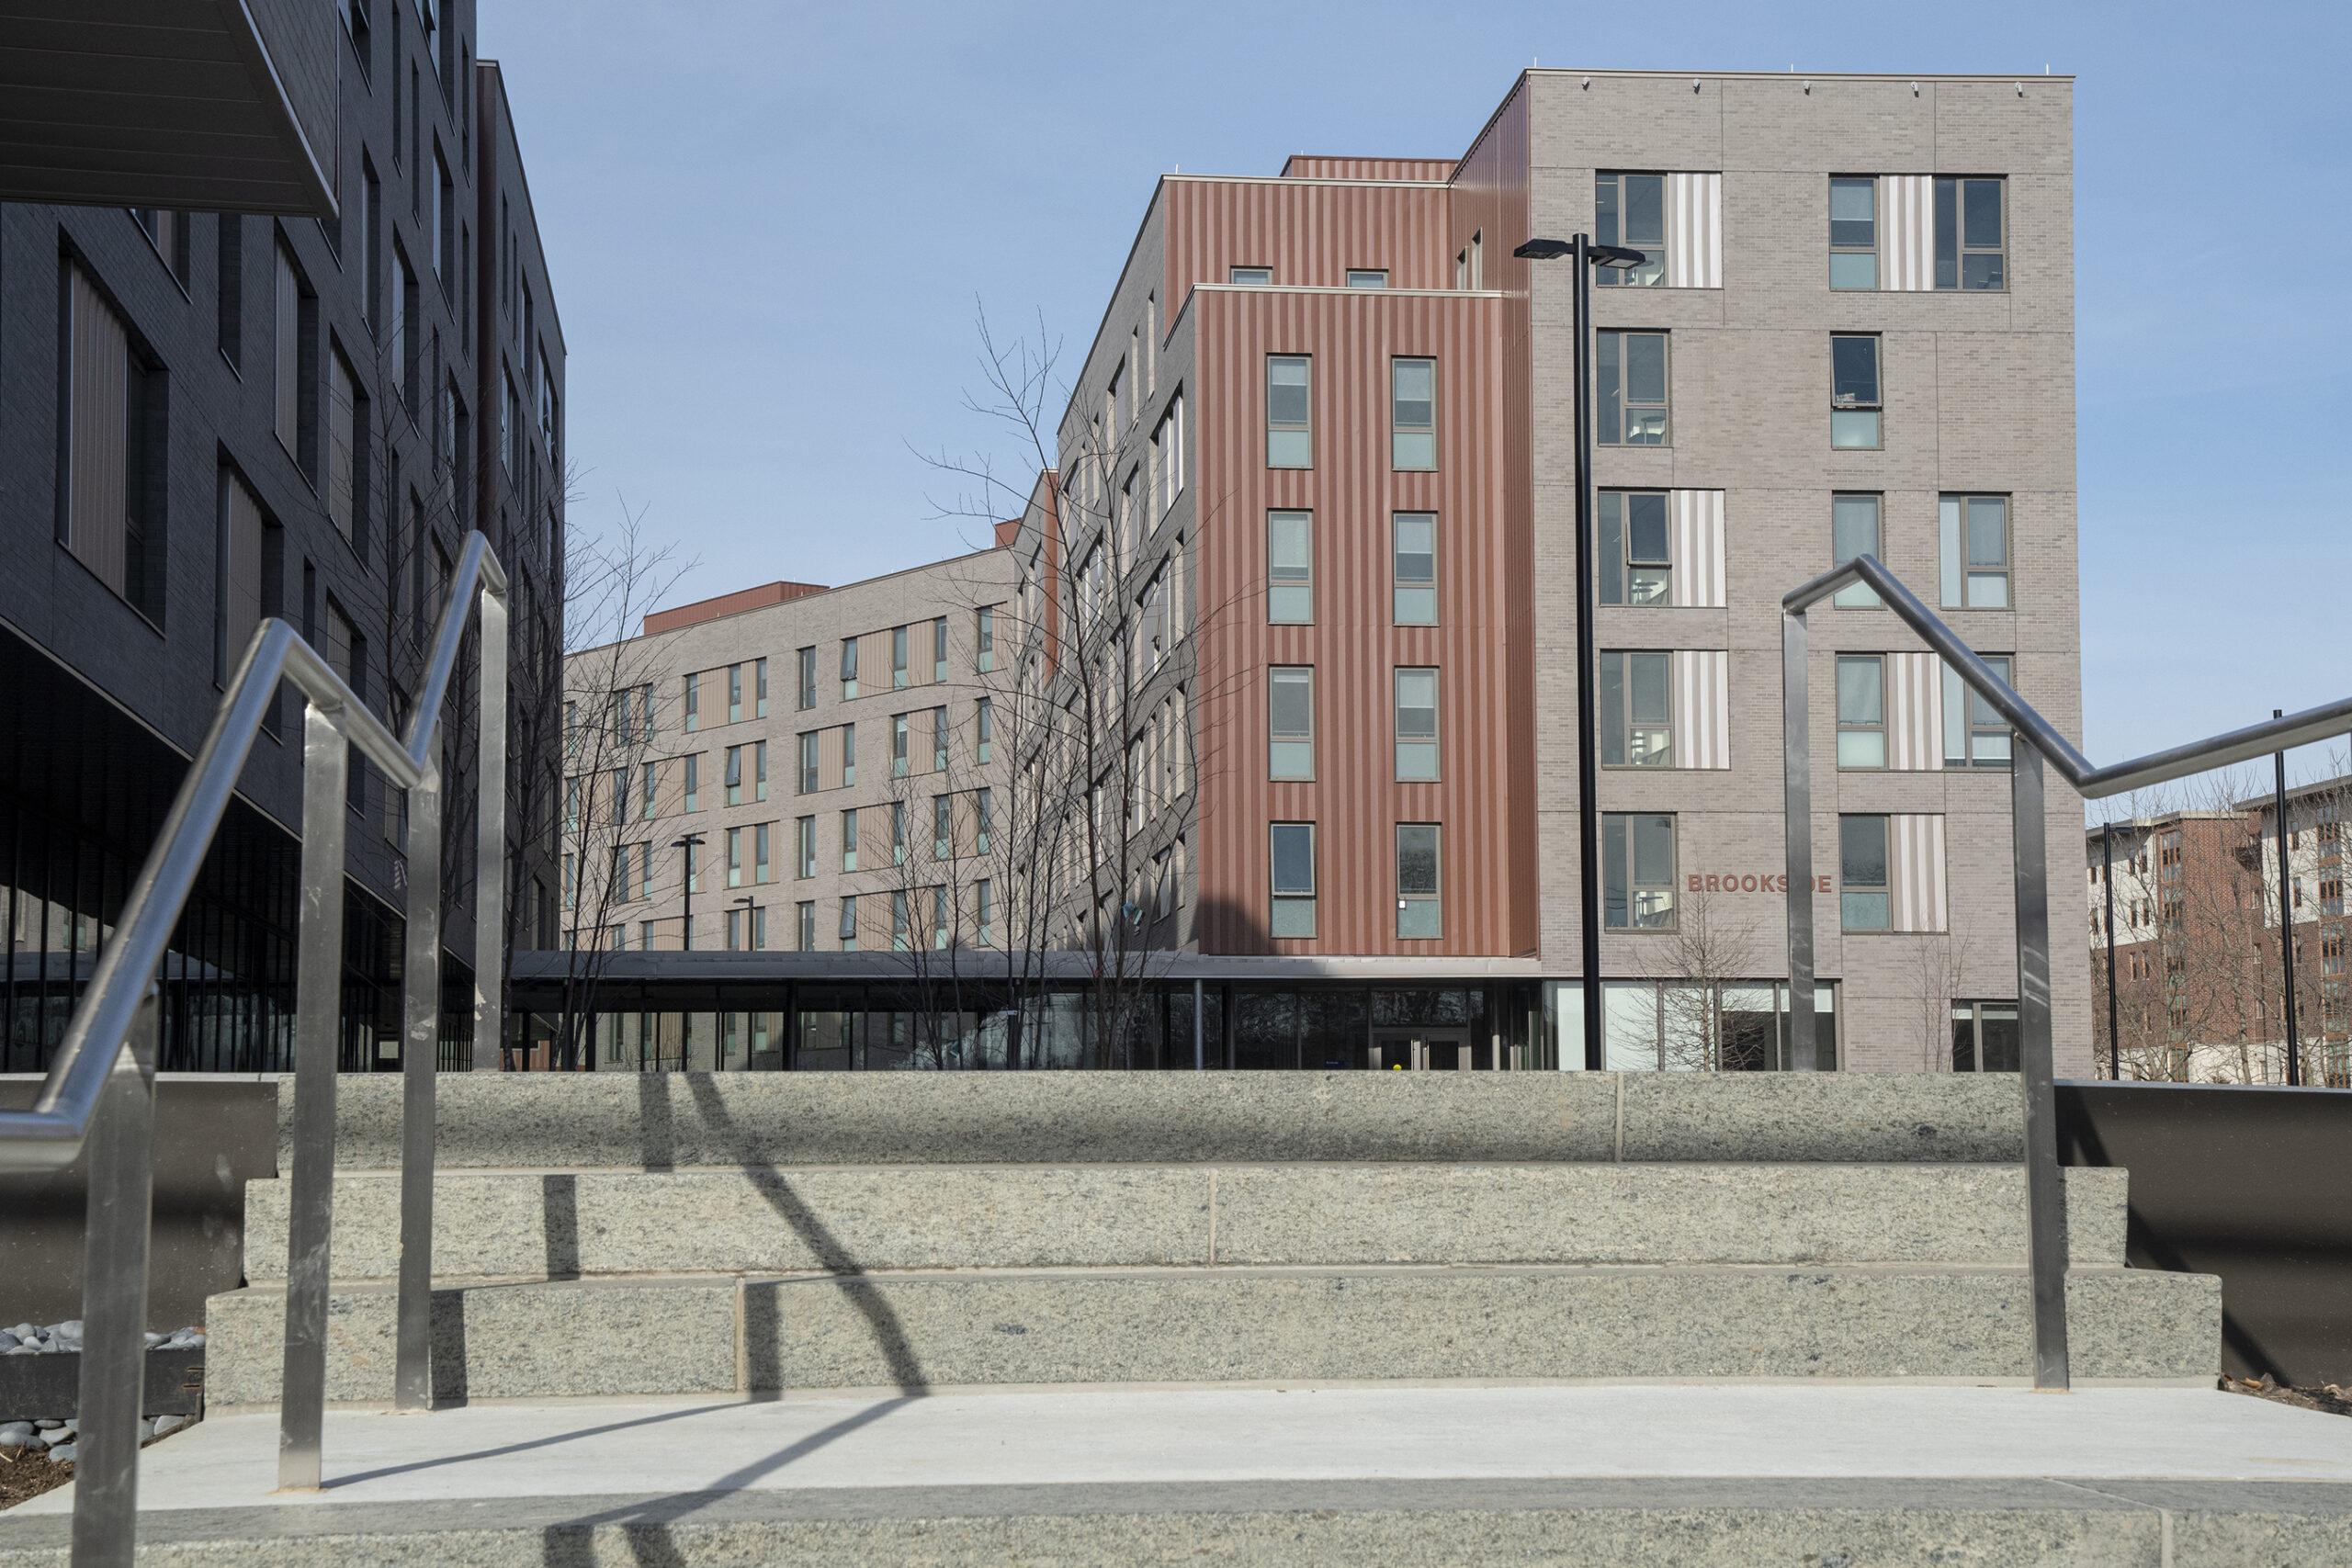 Uri To Reduce On Campus Living25%, Modify Fall Academic Inside Rhode Island University Academic Calendar